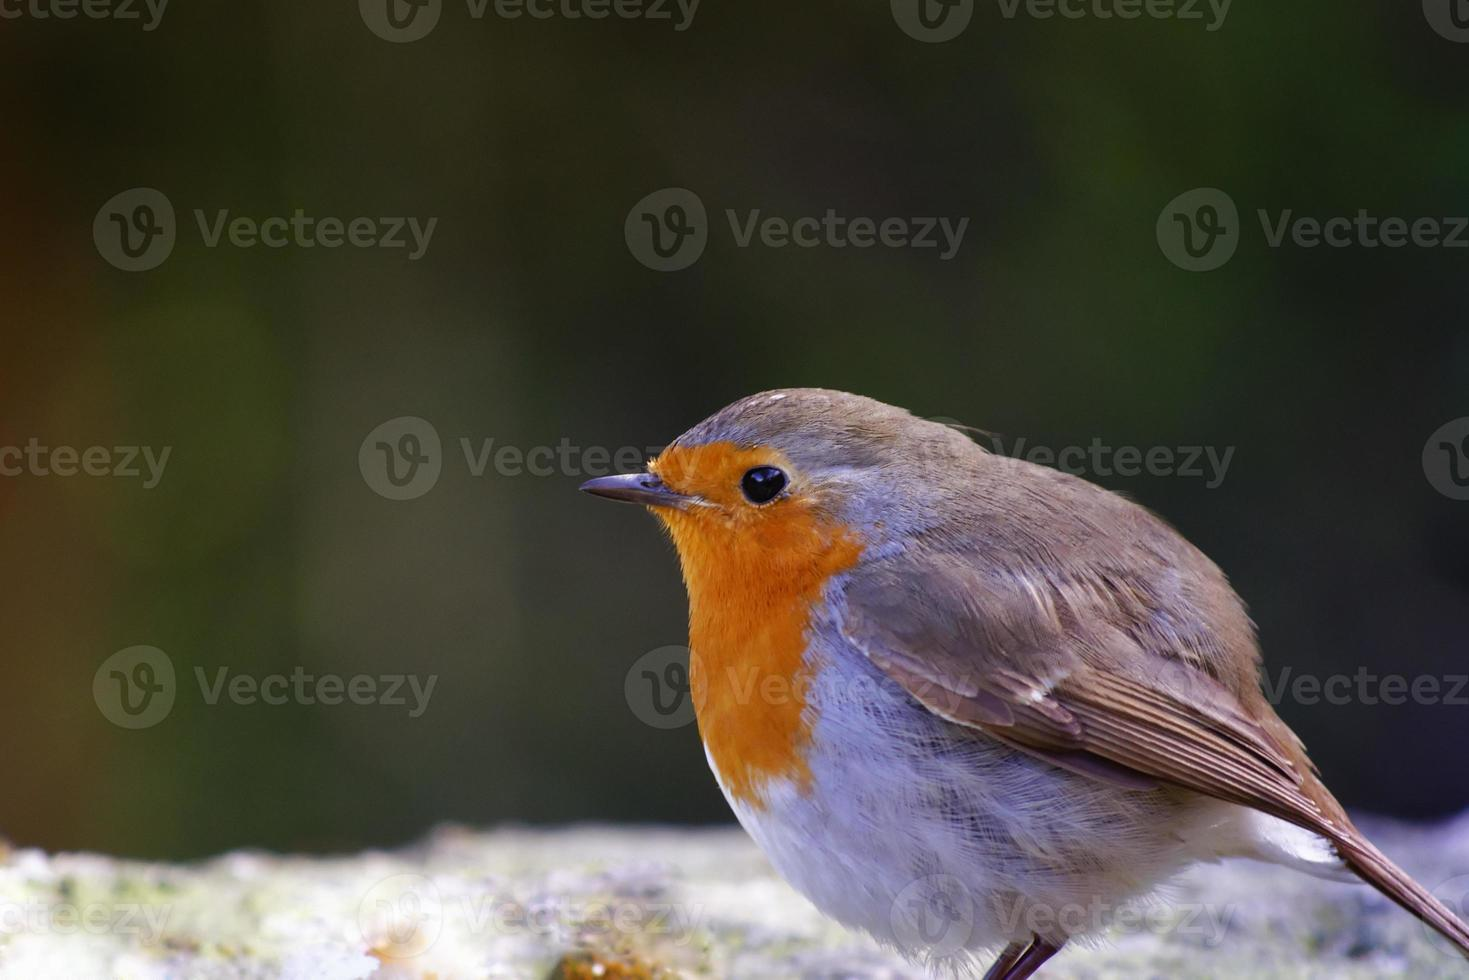 forest birds in Bulgaria photo